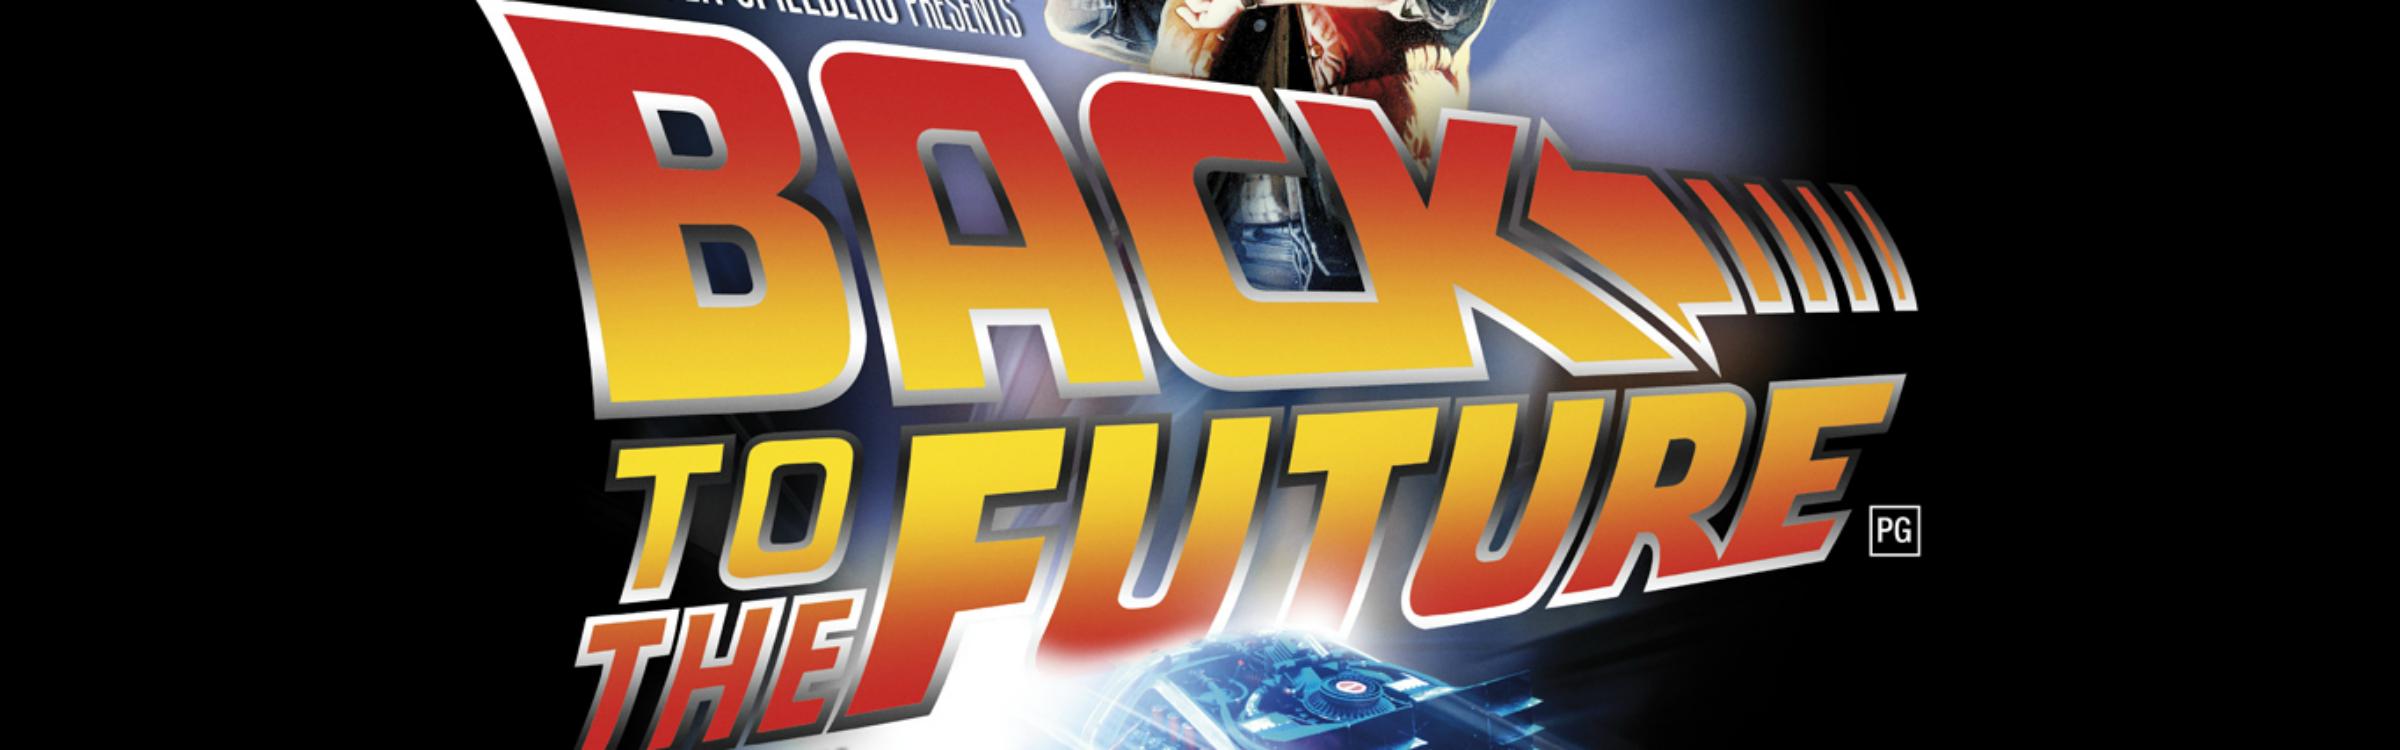 Back to the futureheader